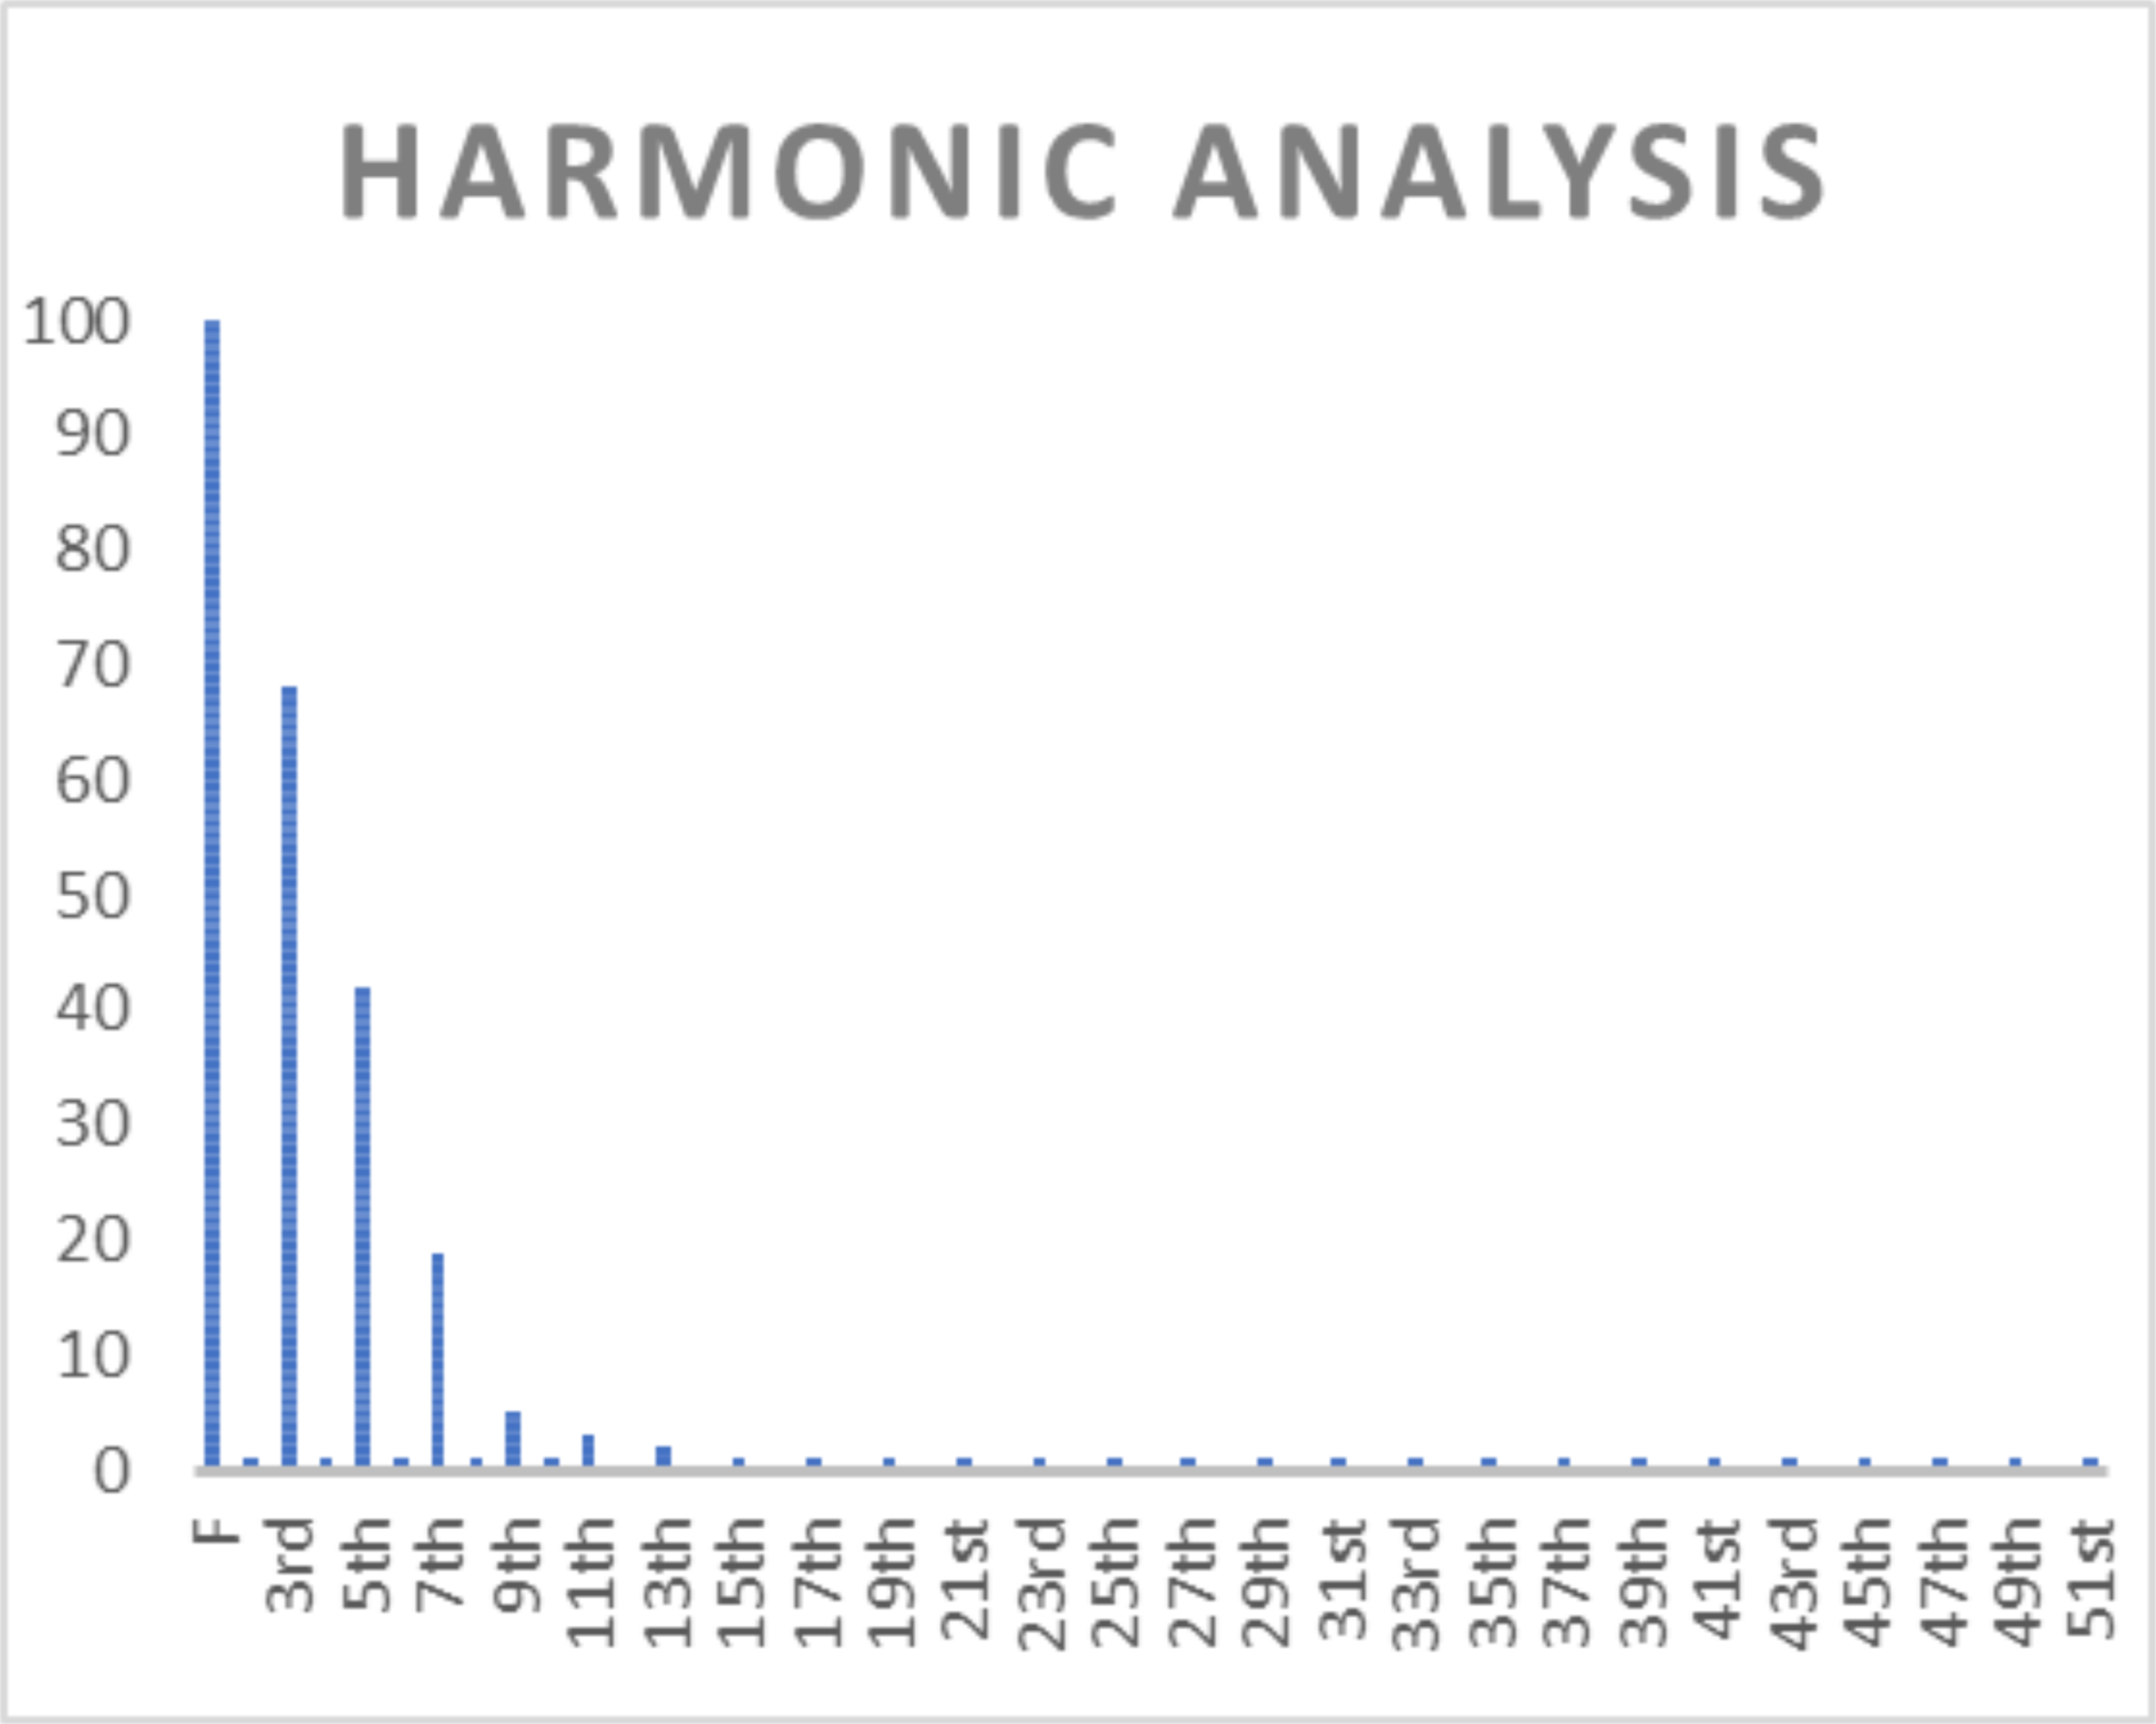 harmonic analysis graph